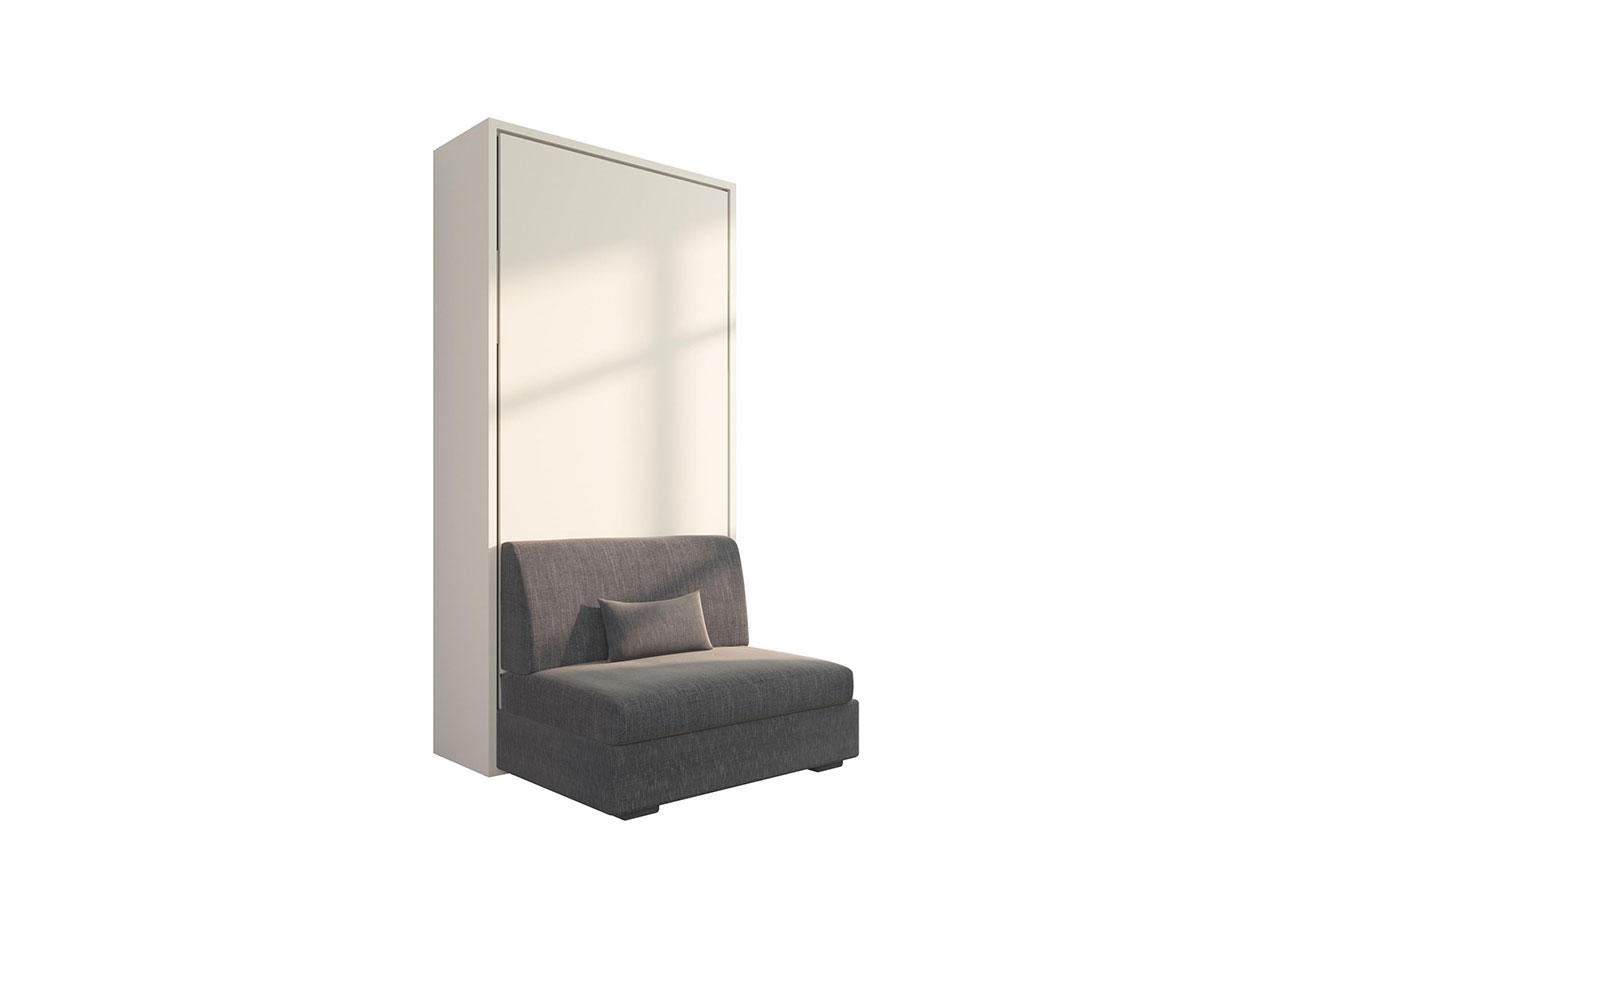 Piuma Sofa 90 - Mobile letto singolo con poltrona pouf Easy